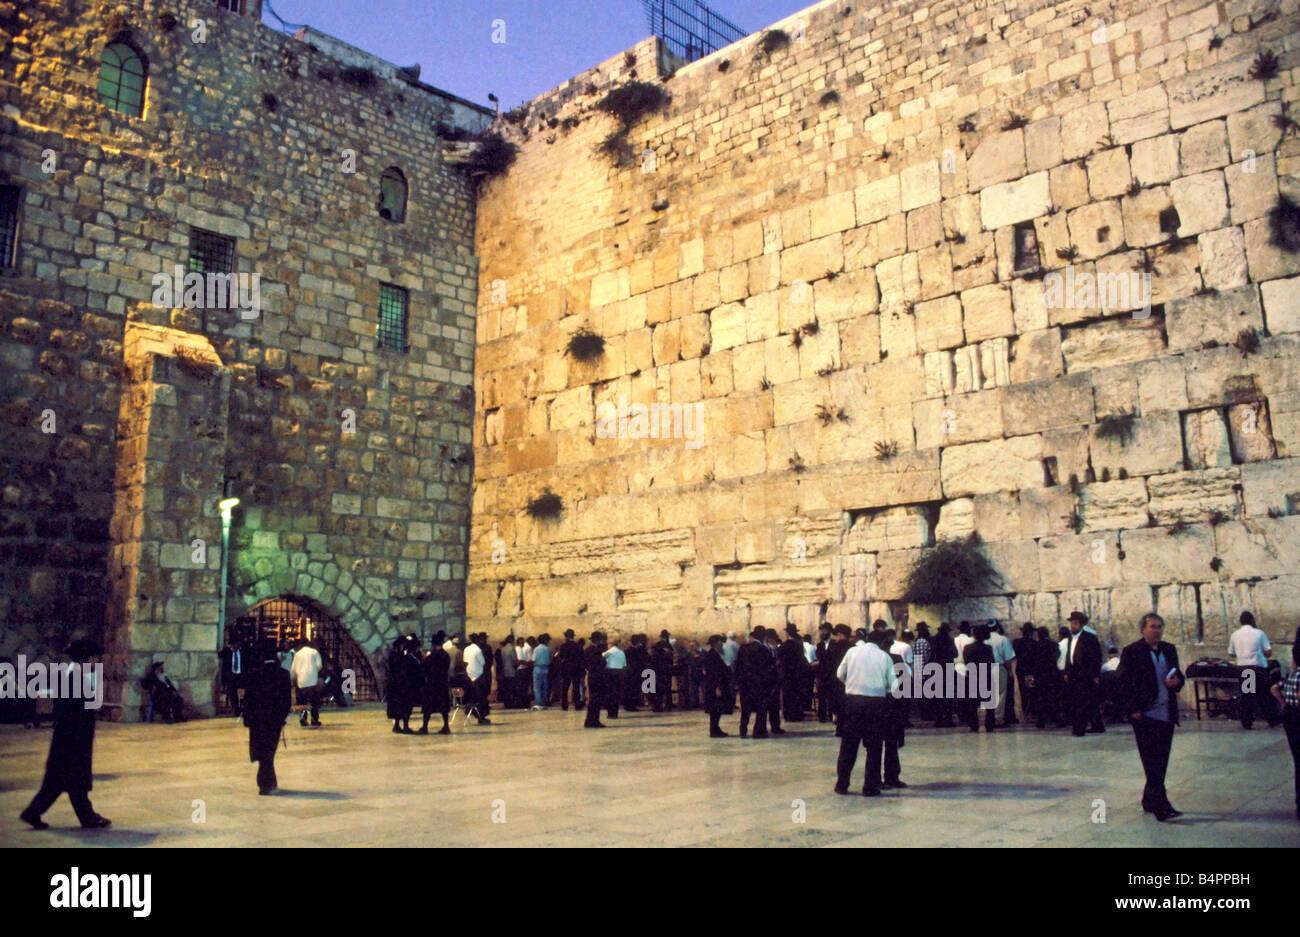 Contemporary Palestinian Wall Art Collection - Art & Wall Decor ...